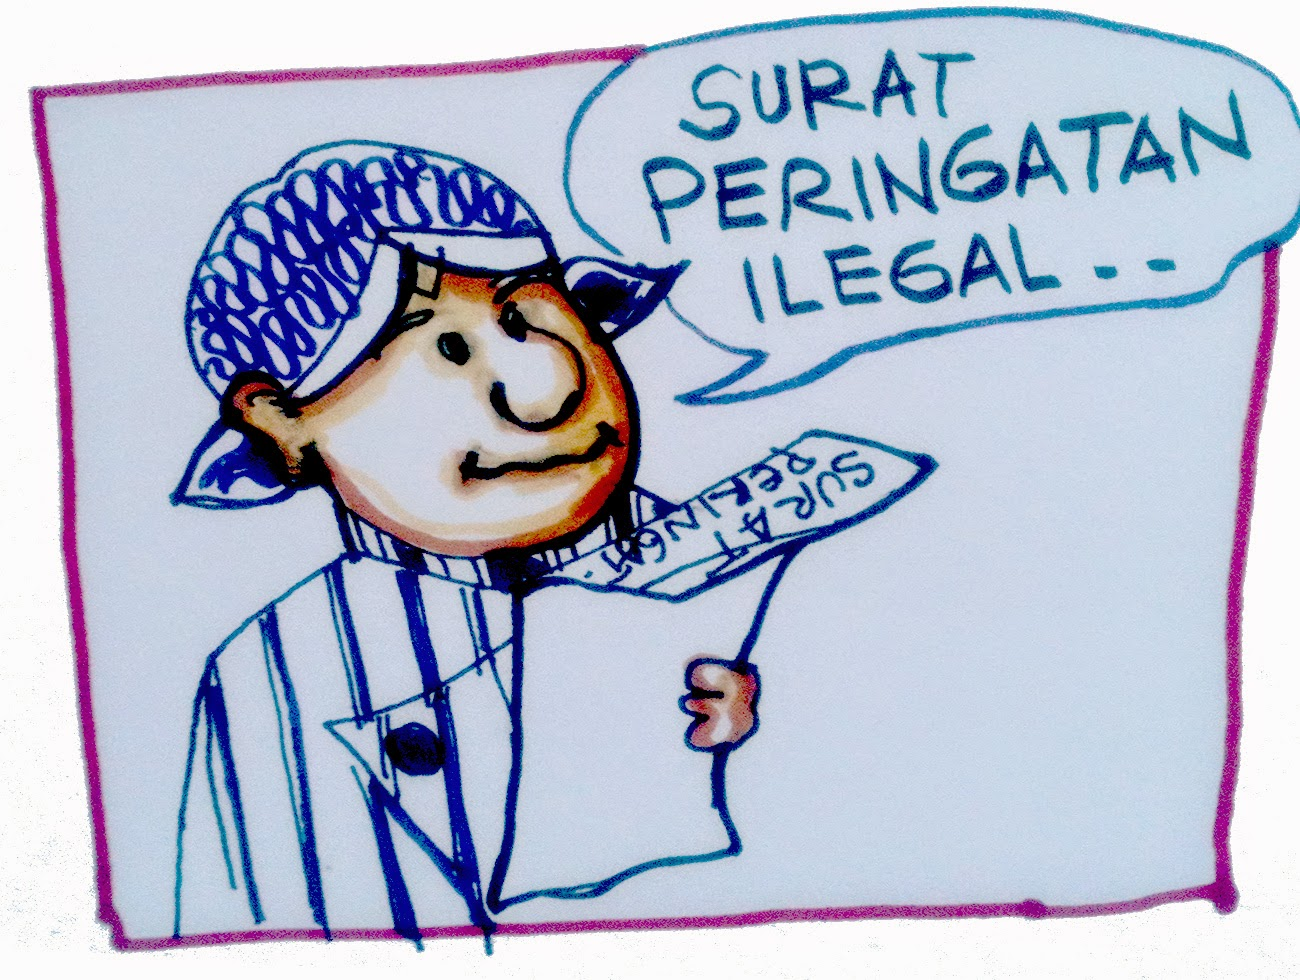 Kari Kartun Surat Peringatan Ilegalhehehe